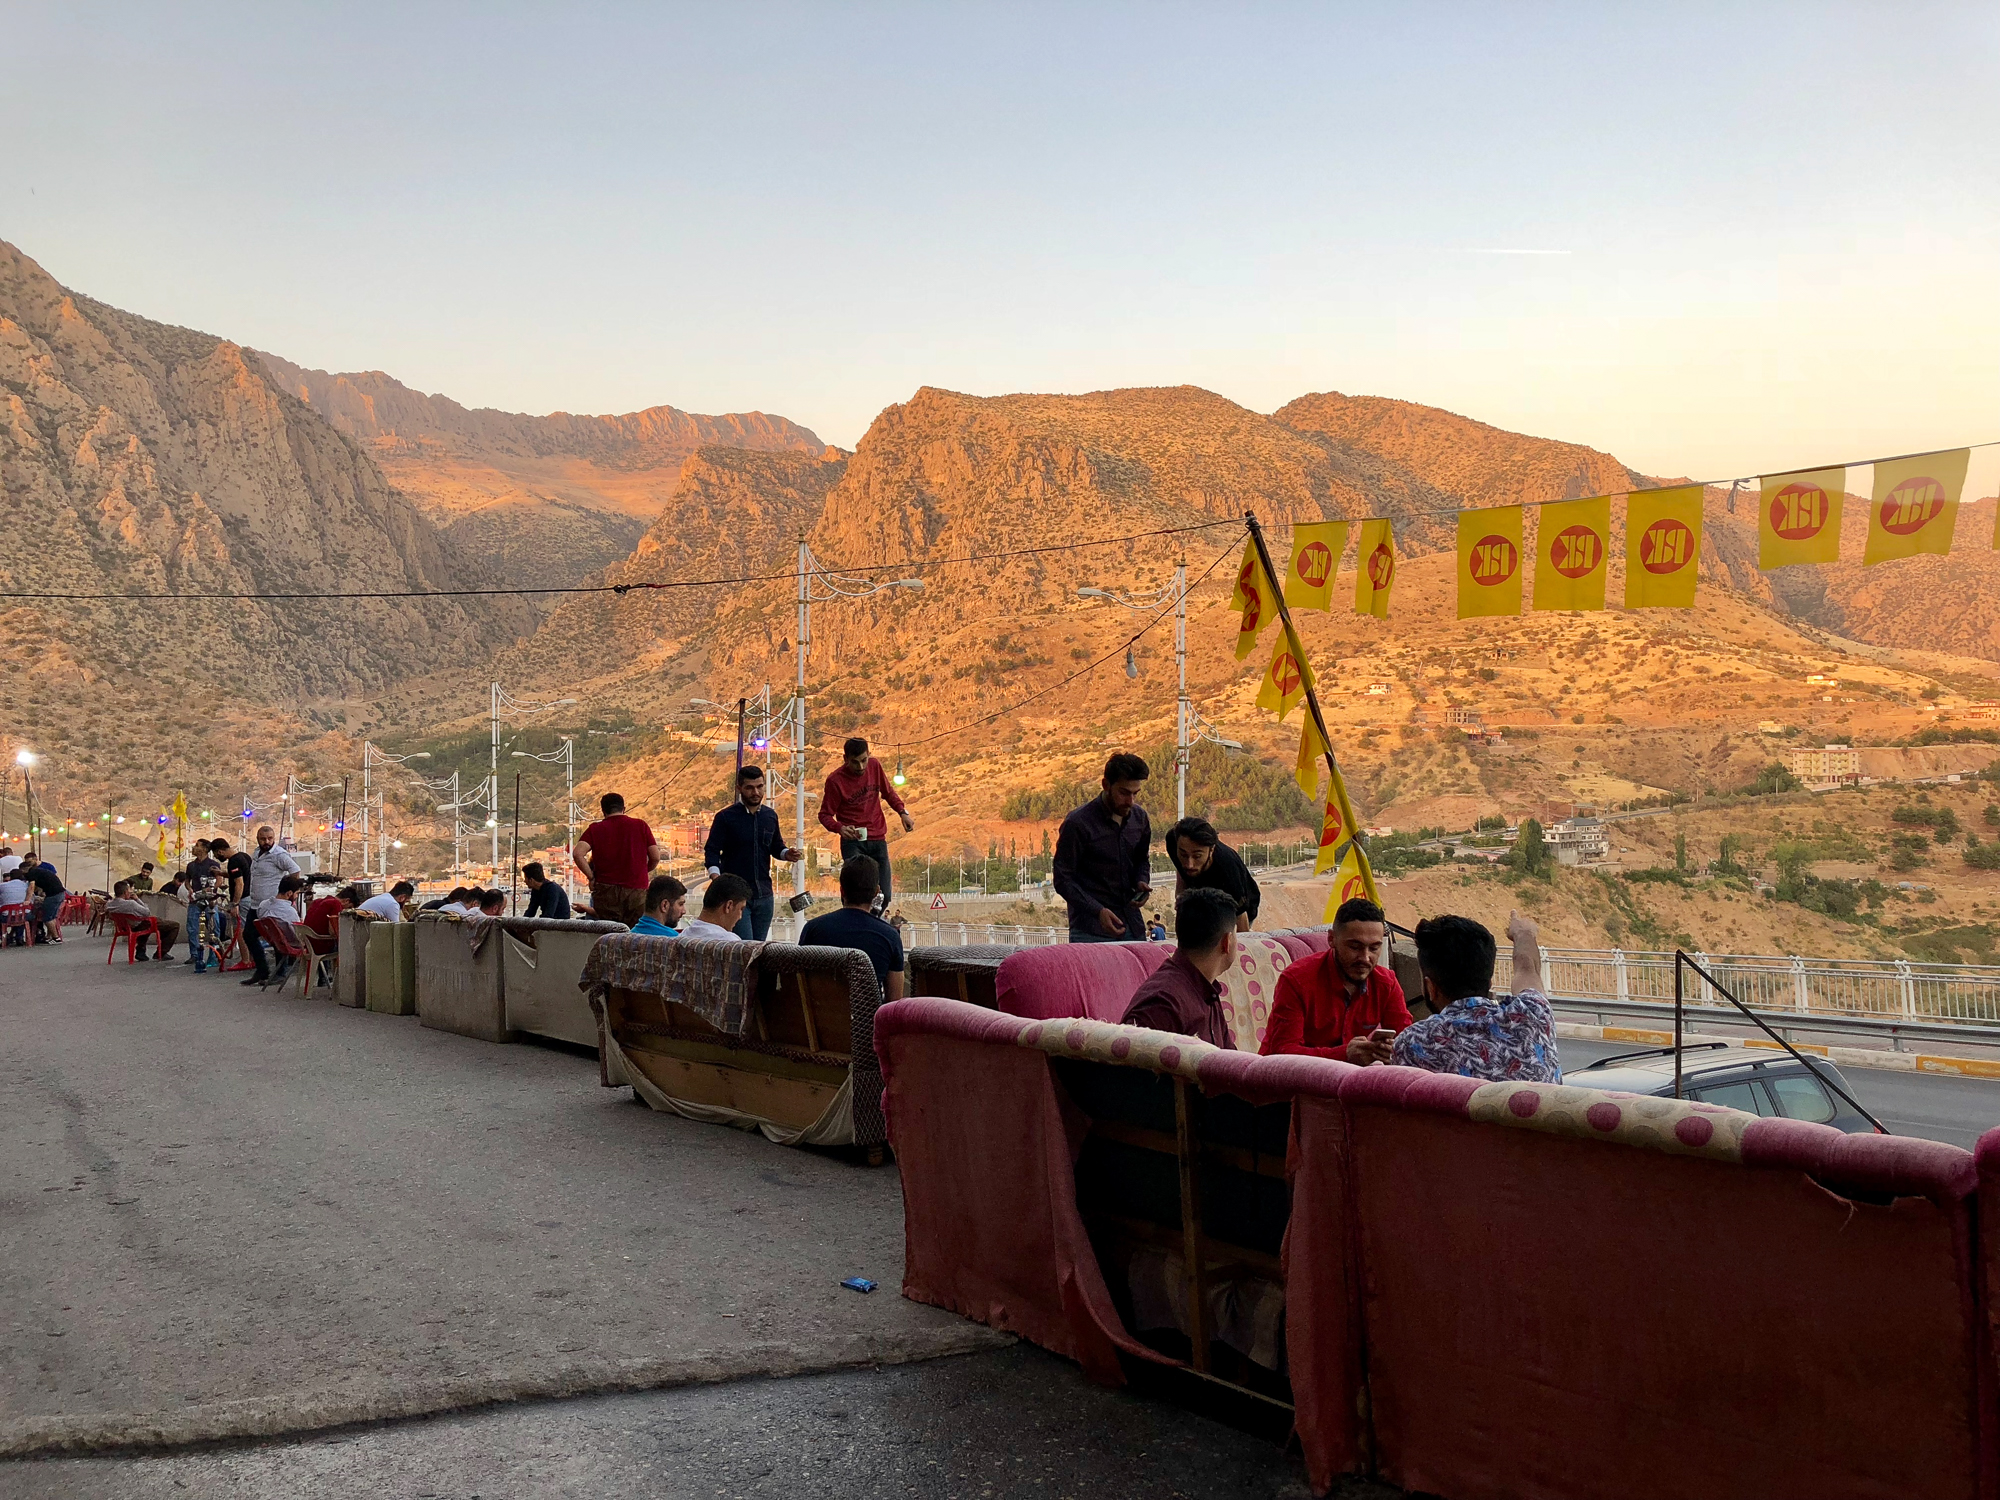 A beatiful bar outside the city of Amediye